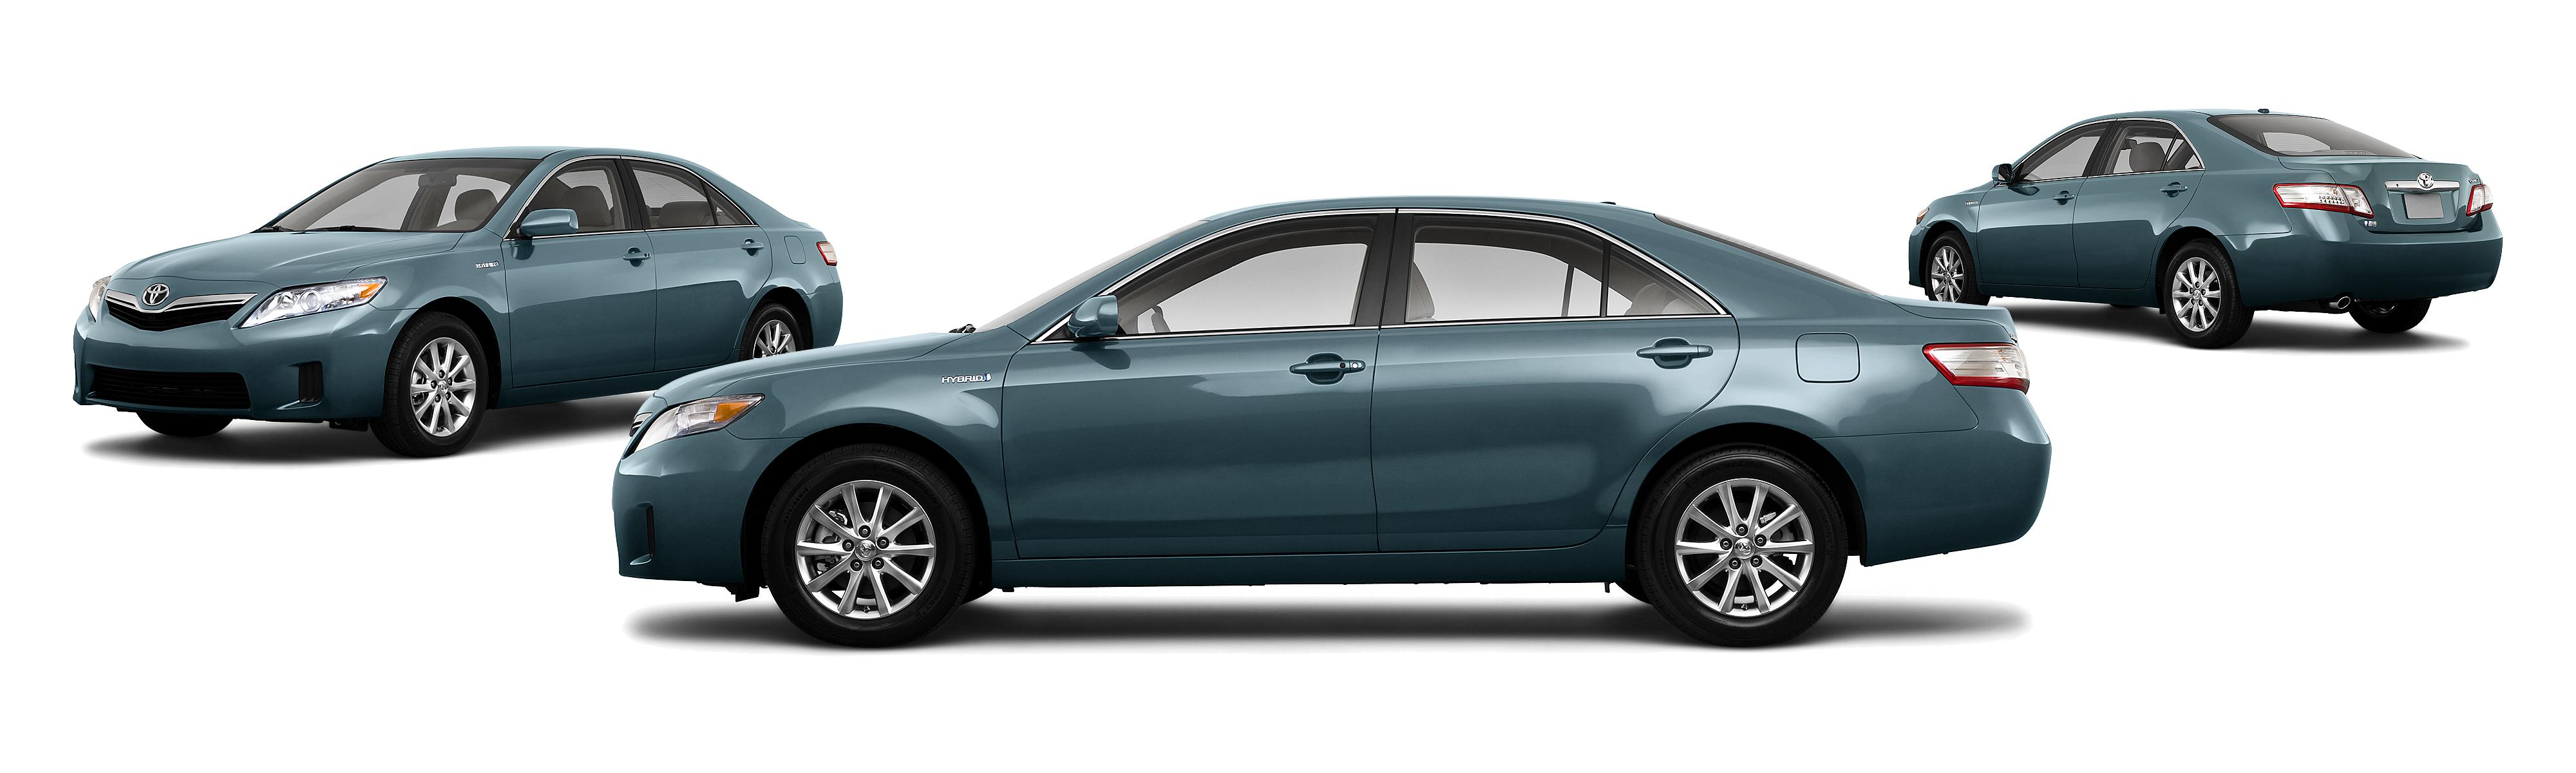 2010 Toyota Camry Hybrid Base 4dr Sedan Research GrooveCar